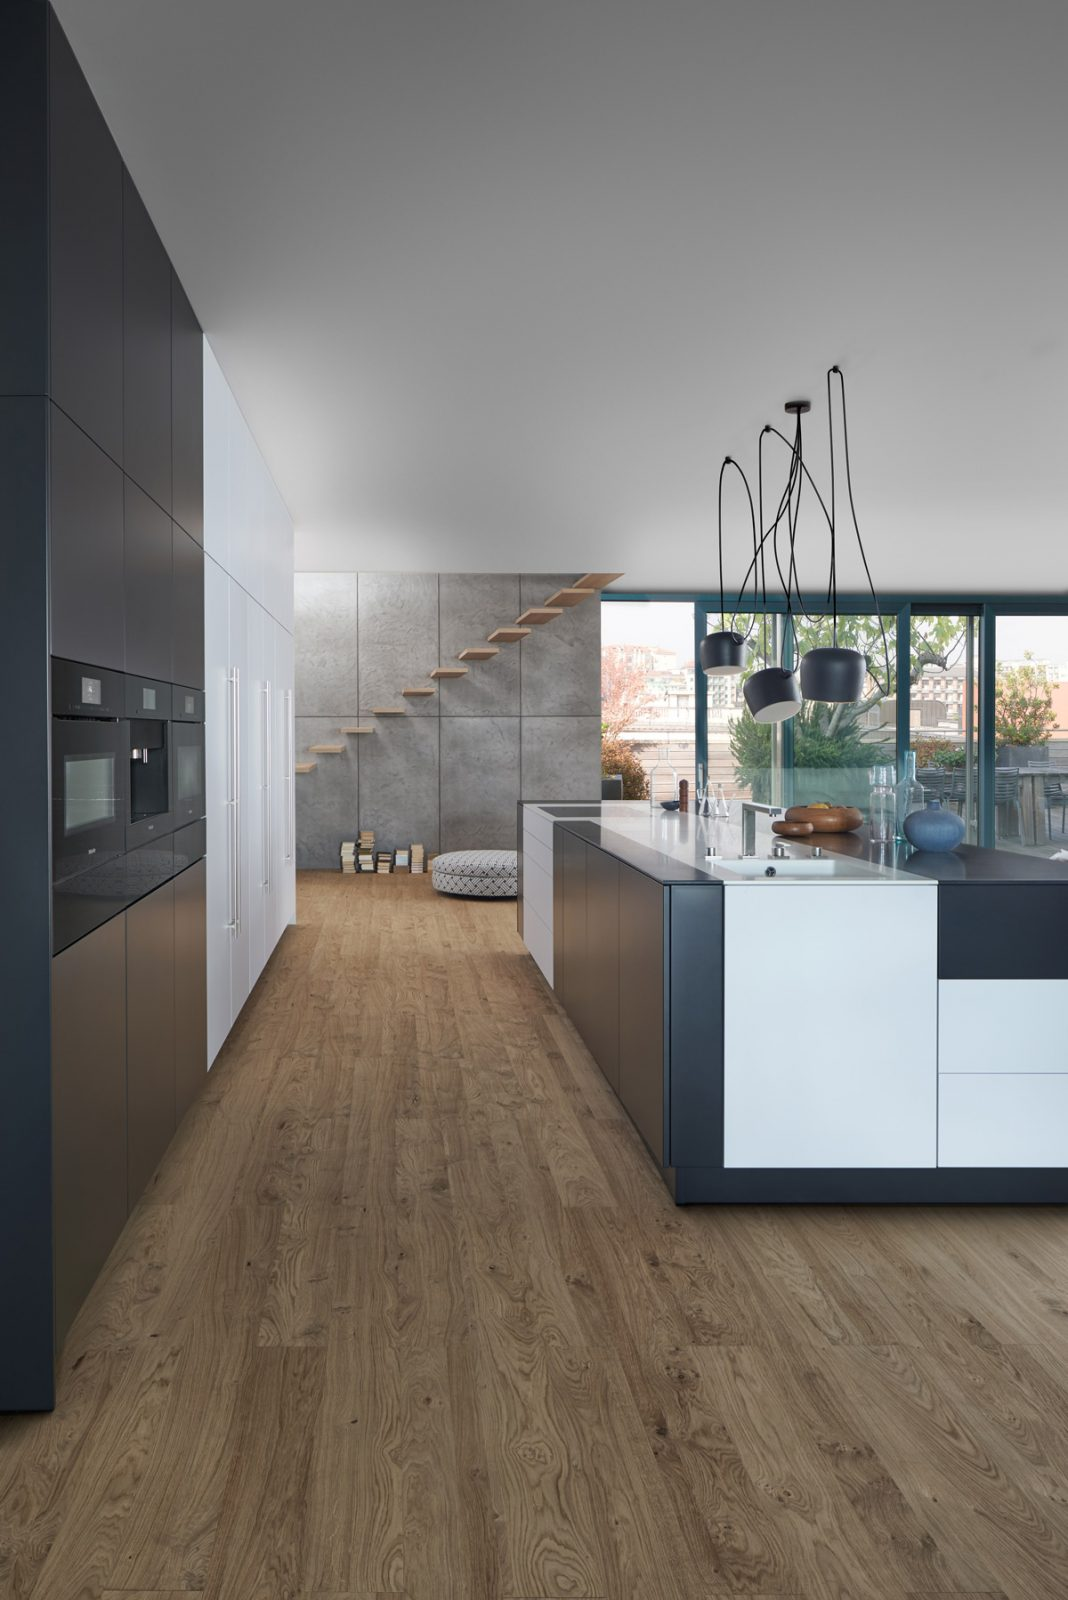 Zelari-Leicht_cocinas-premium_Kitchen-Design-Cocinas-de-alta-gama-Madrid_arquitectura-de-cocinas